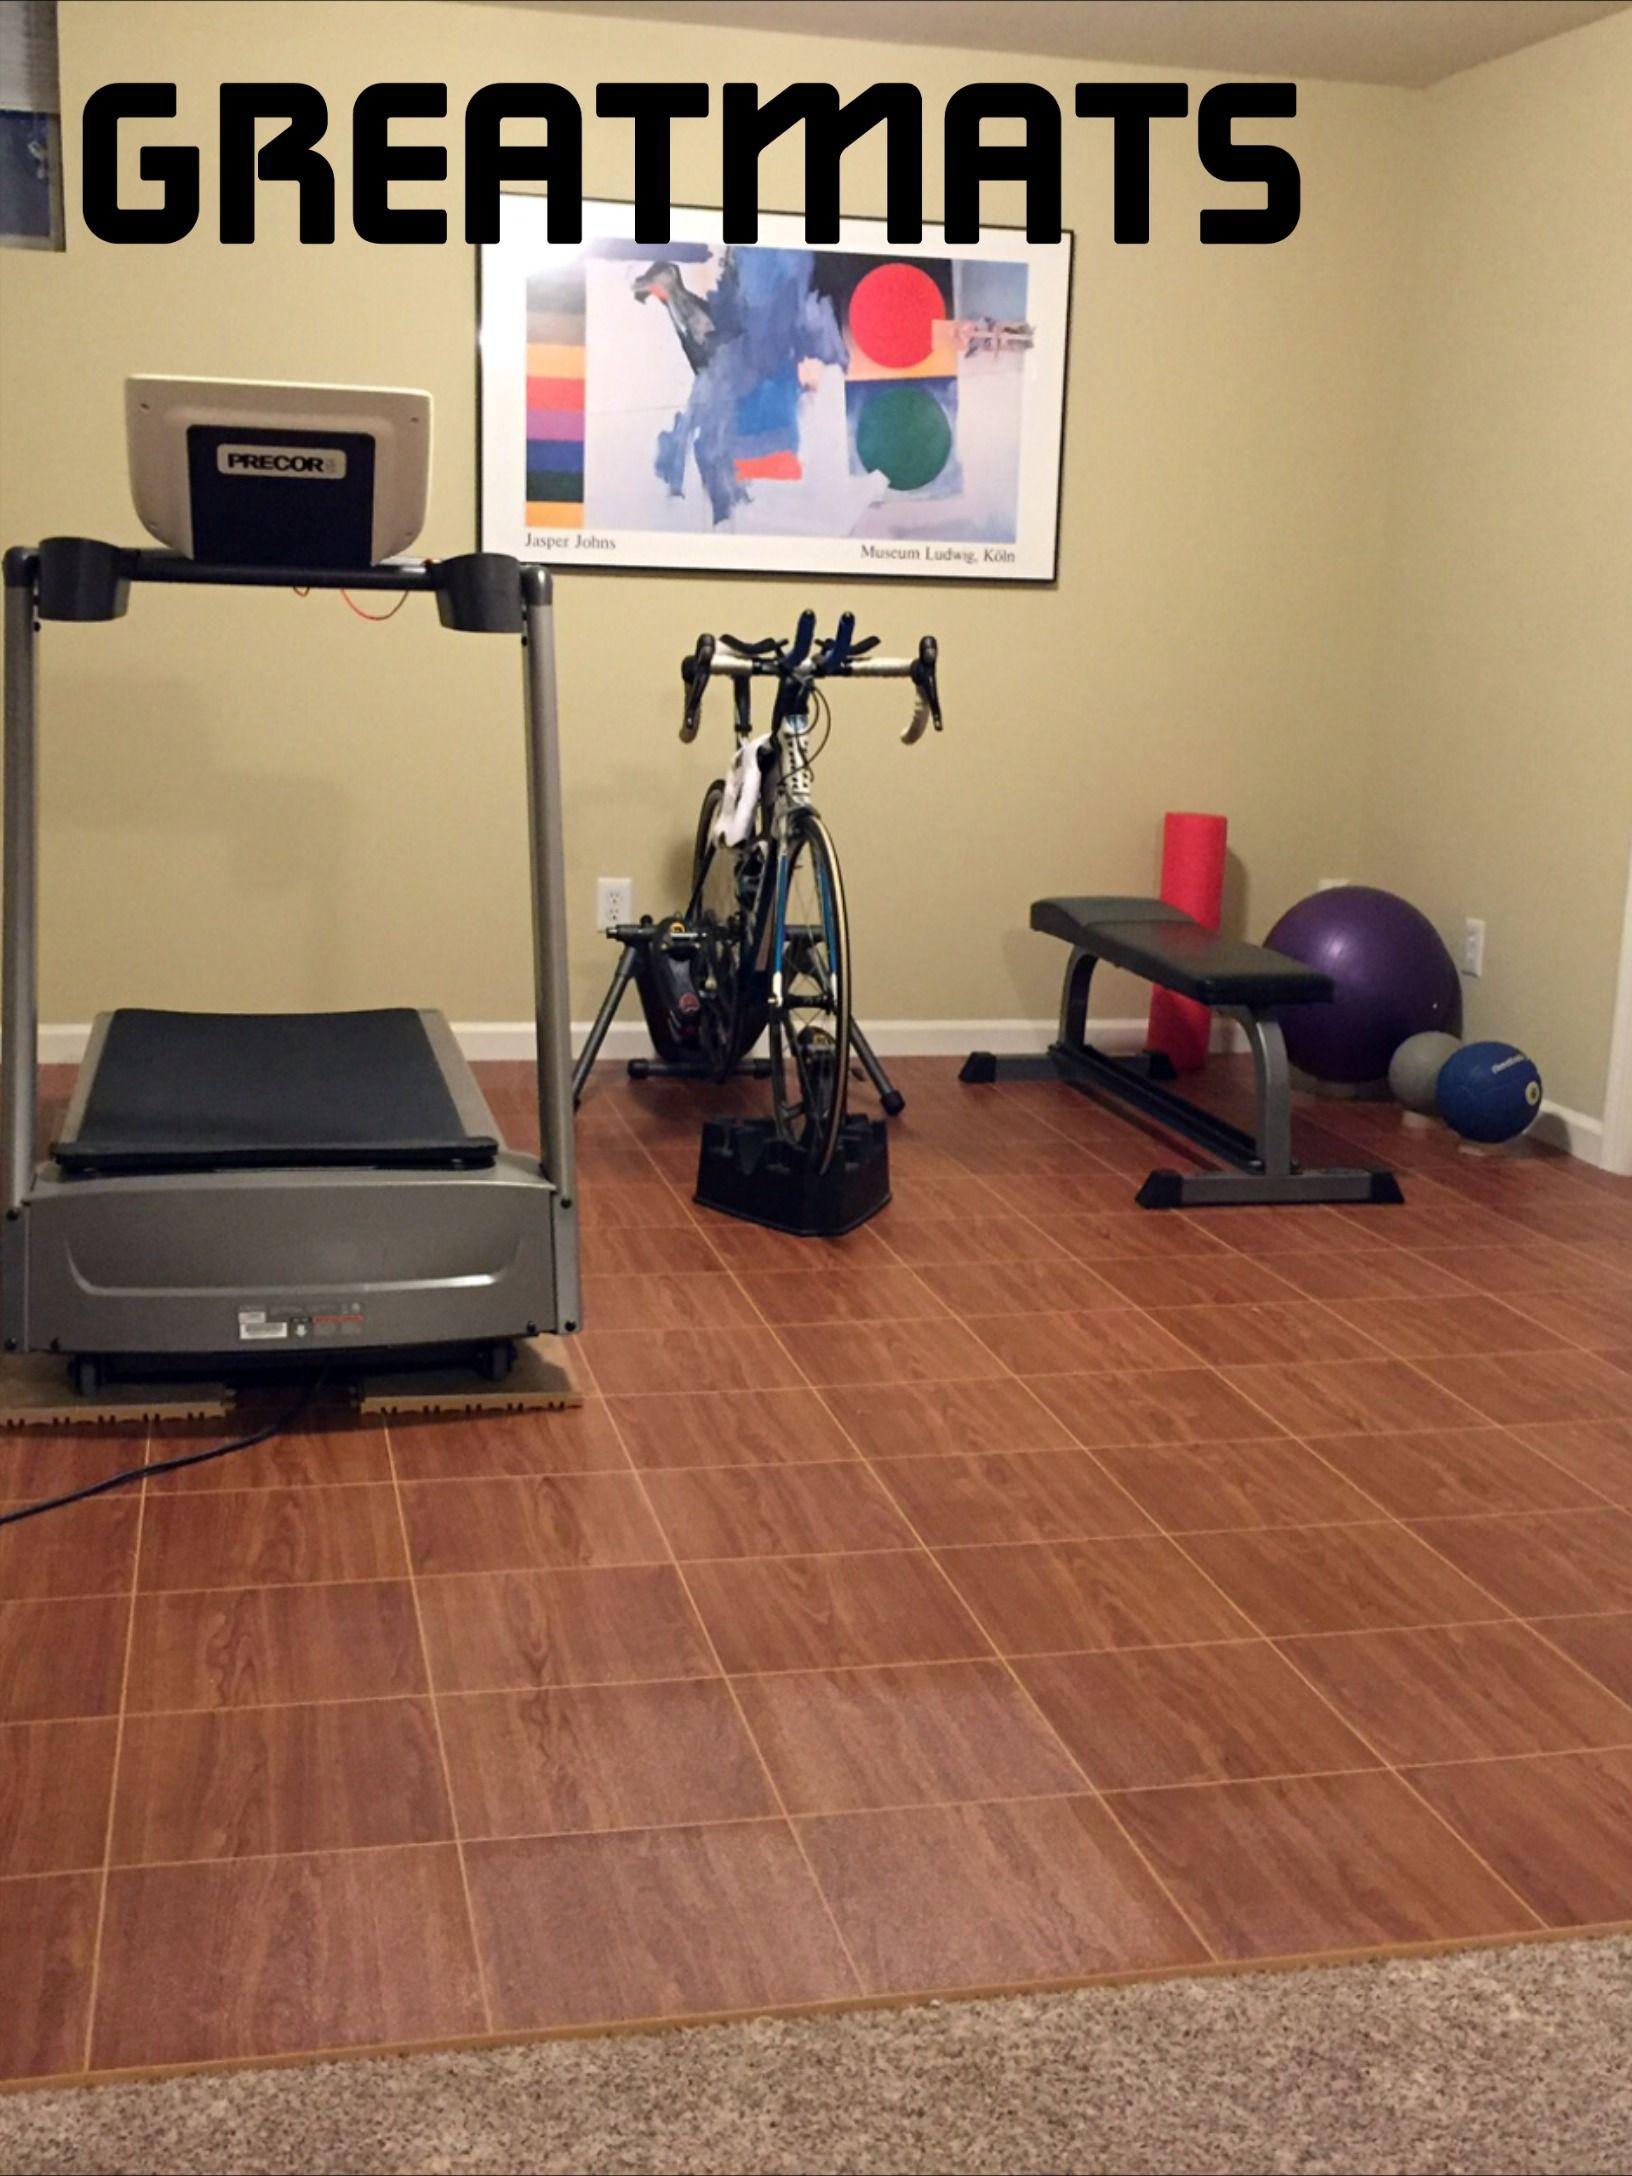 Max Tile Raised Floor Tile Home gym flooring, Portable